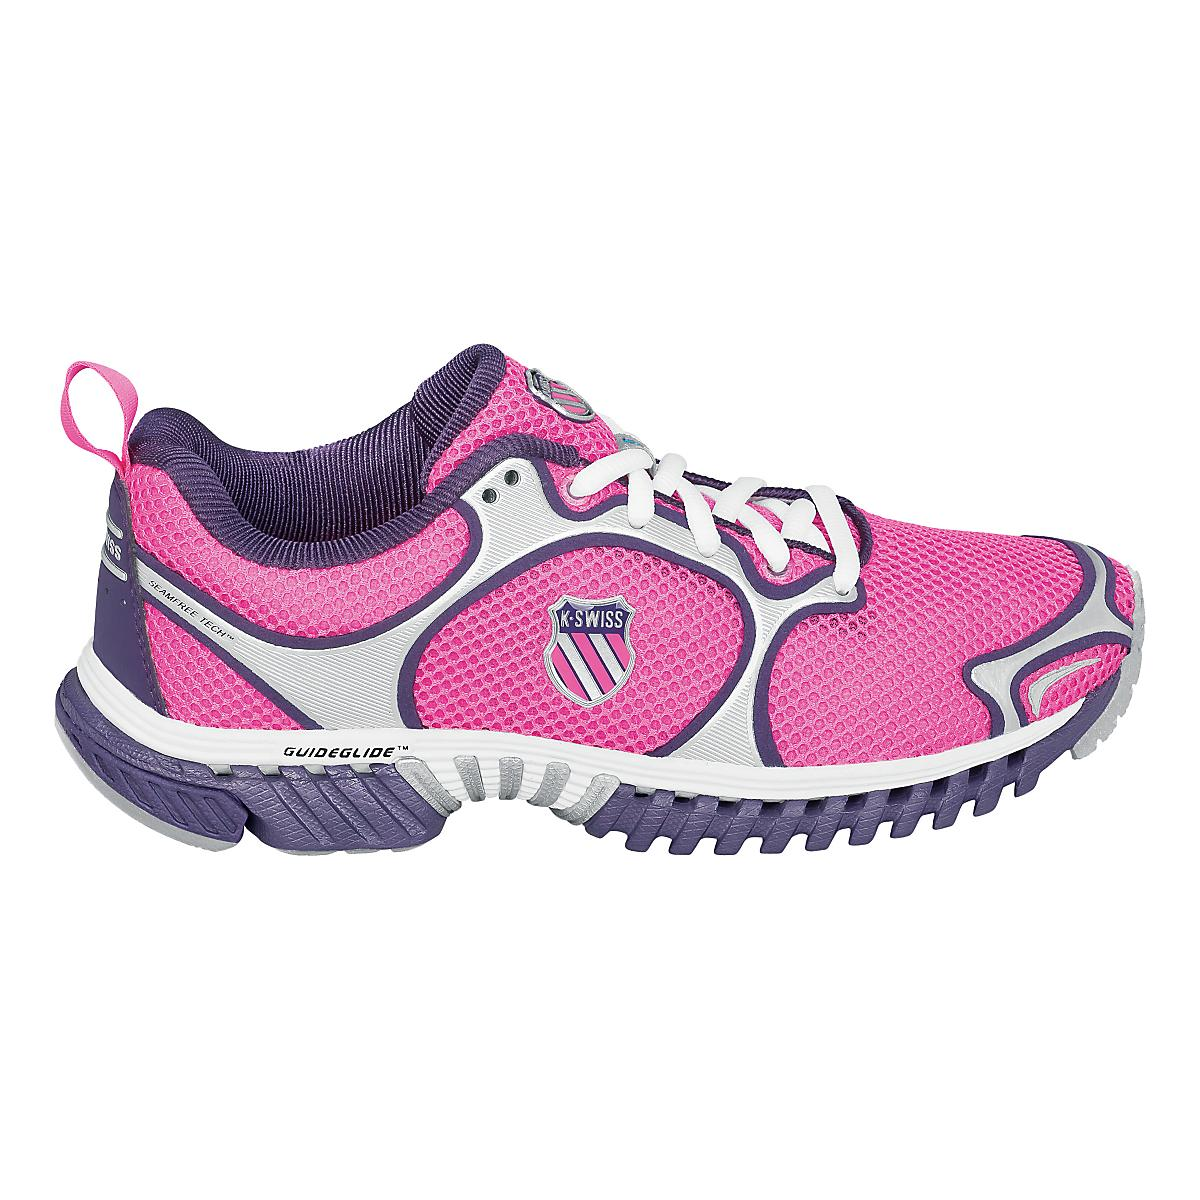 K Swiss Kwicky Blade Light Womens Running Shoes